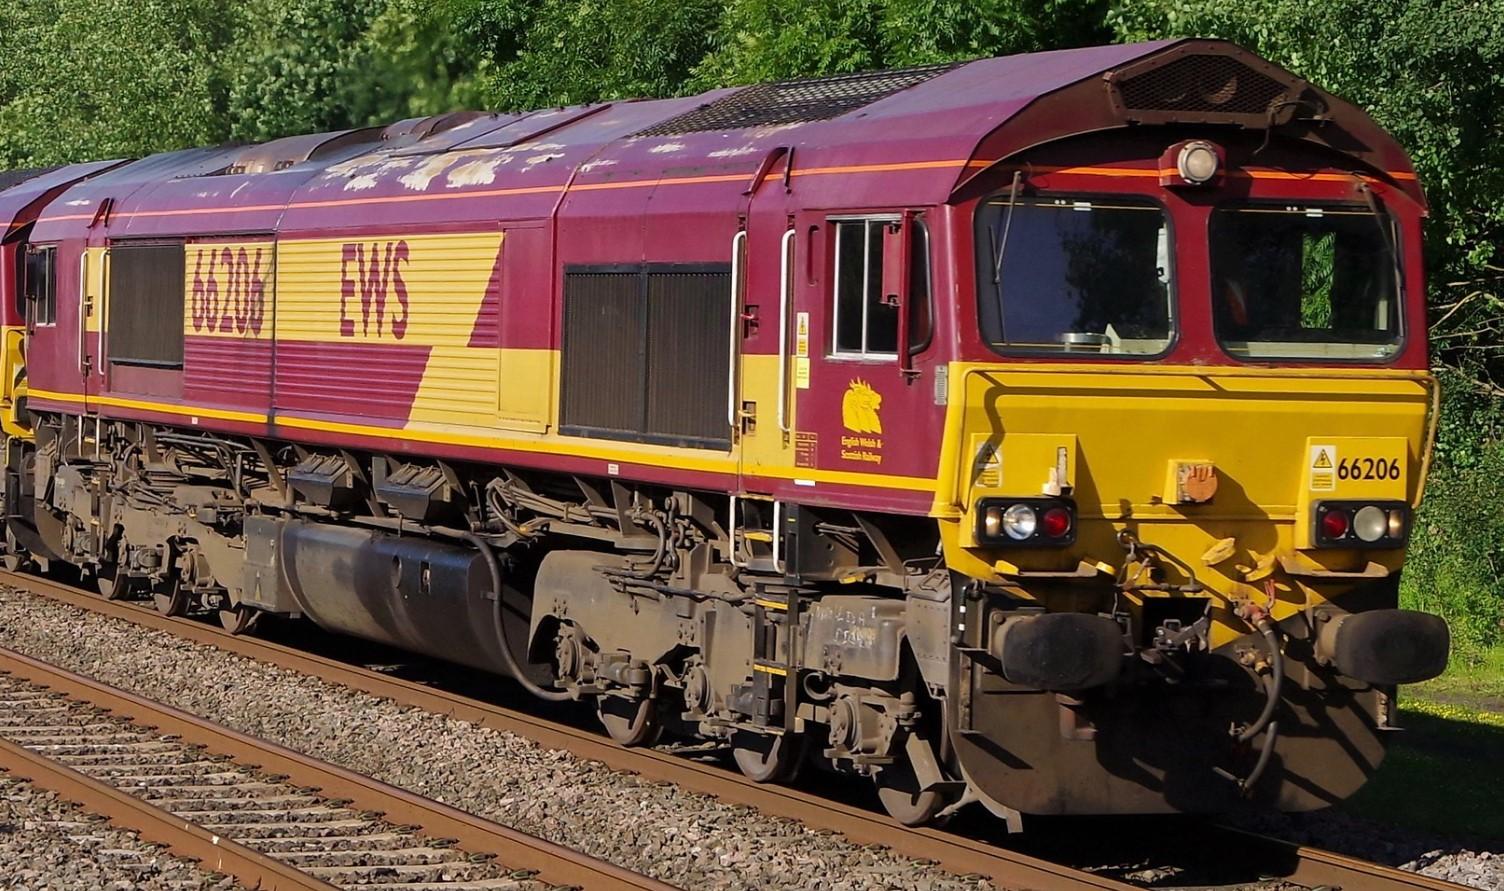 66206 at Barton in June 2016. ©Clagmaster